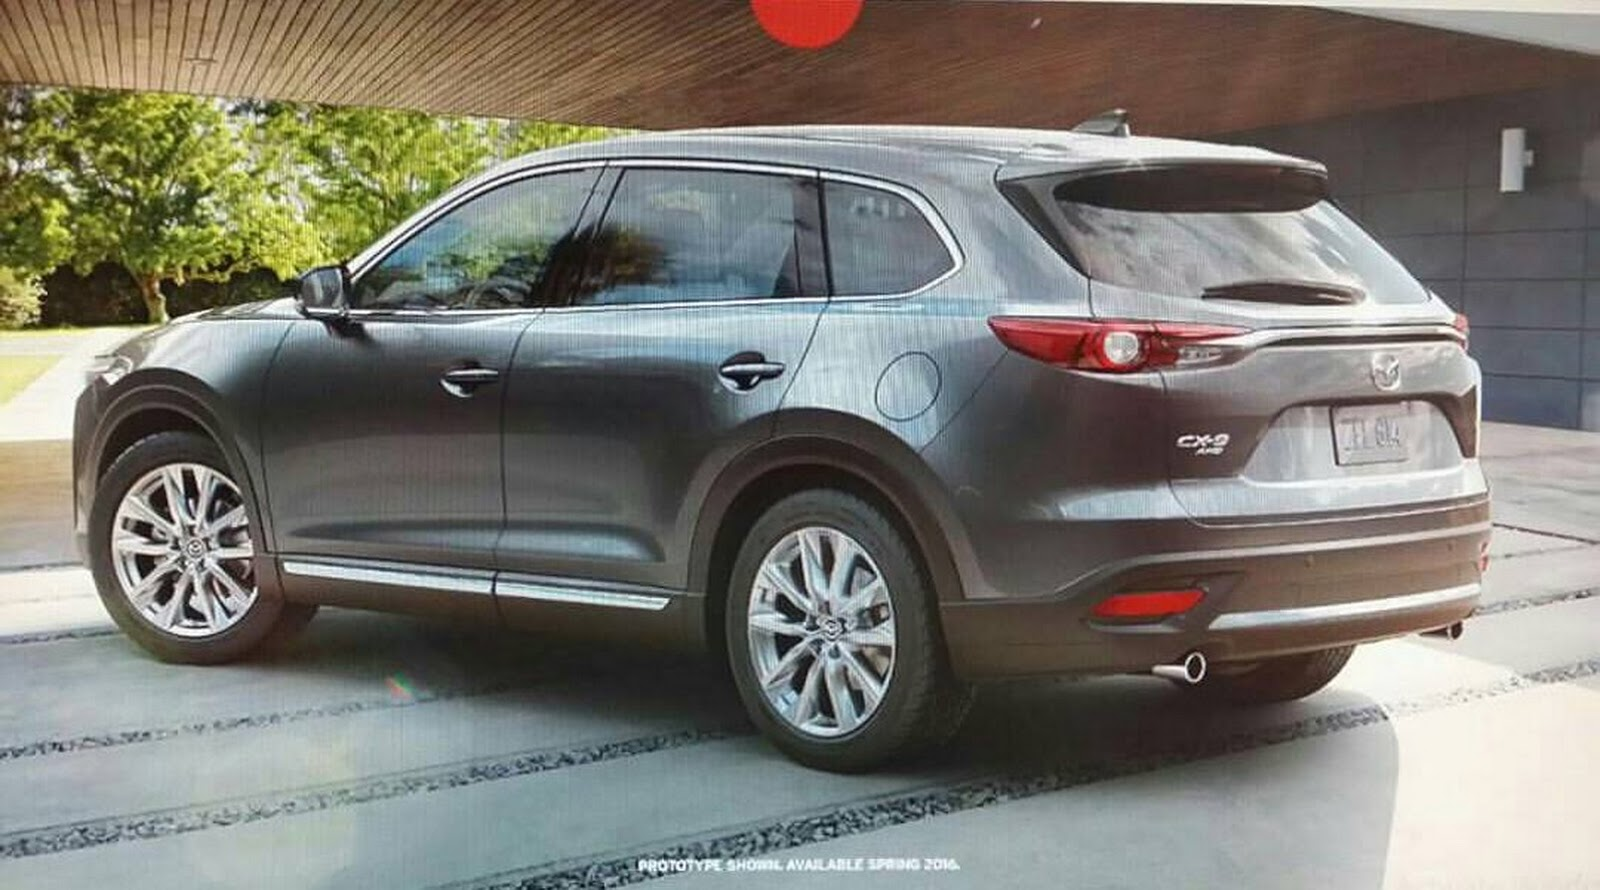 Mazda Cx 6 >> 今週発表の新型CX-9、印刷物からのリーク、きた!? | マツダ車専門・輸入&オリジナルパーツ販売 MAZPARTS ...